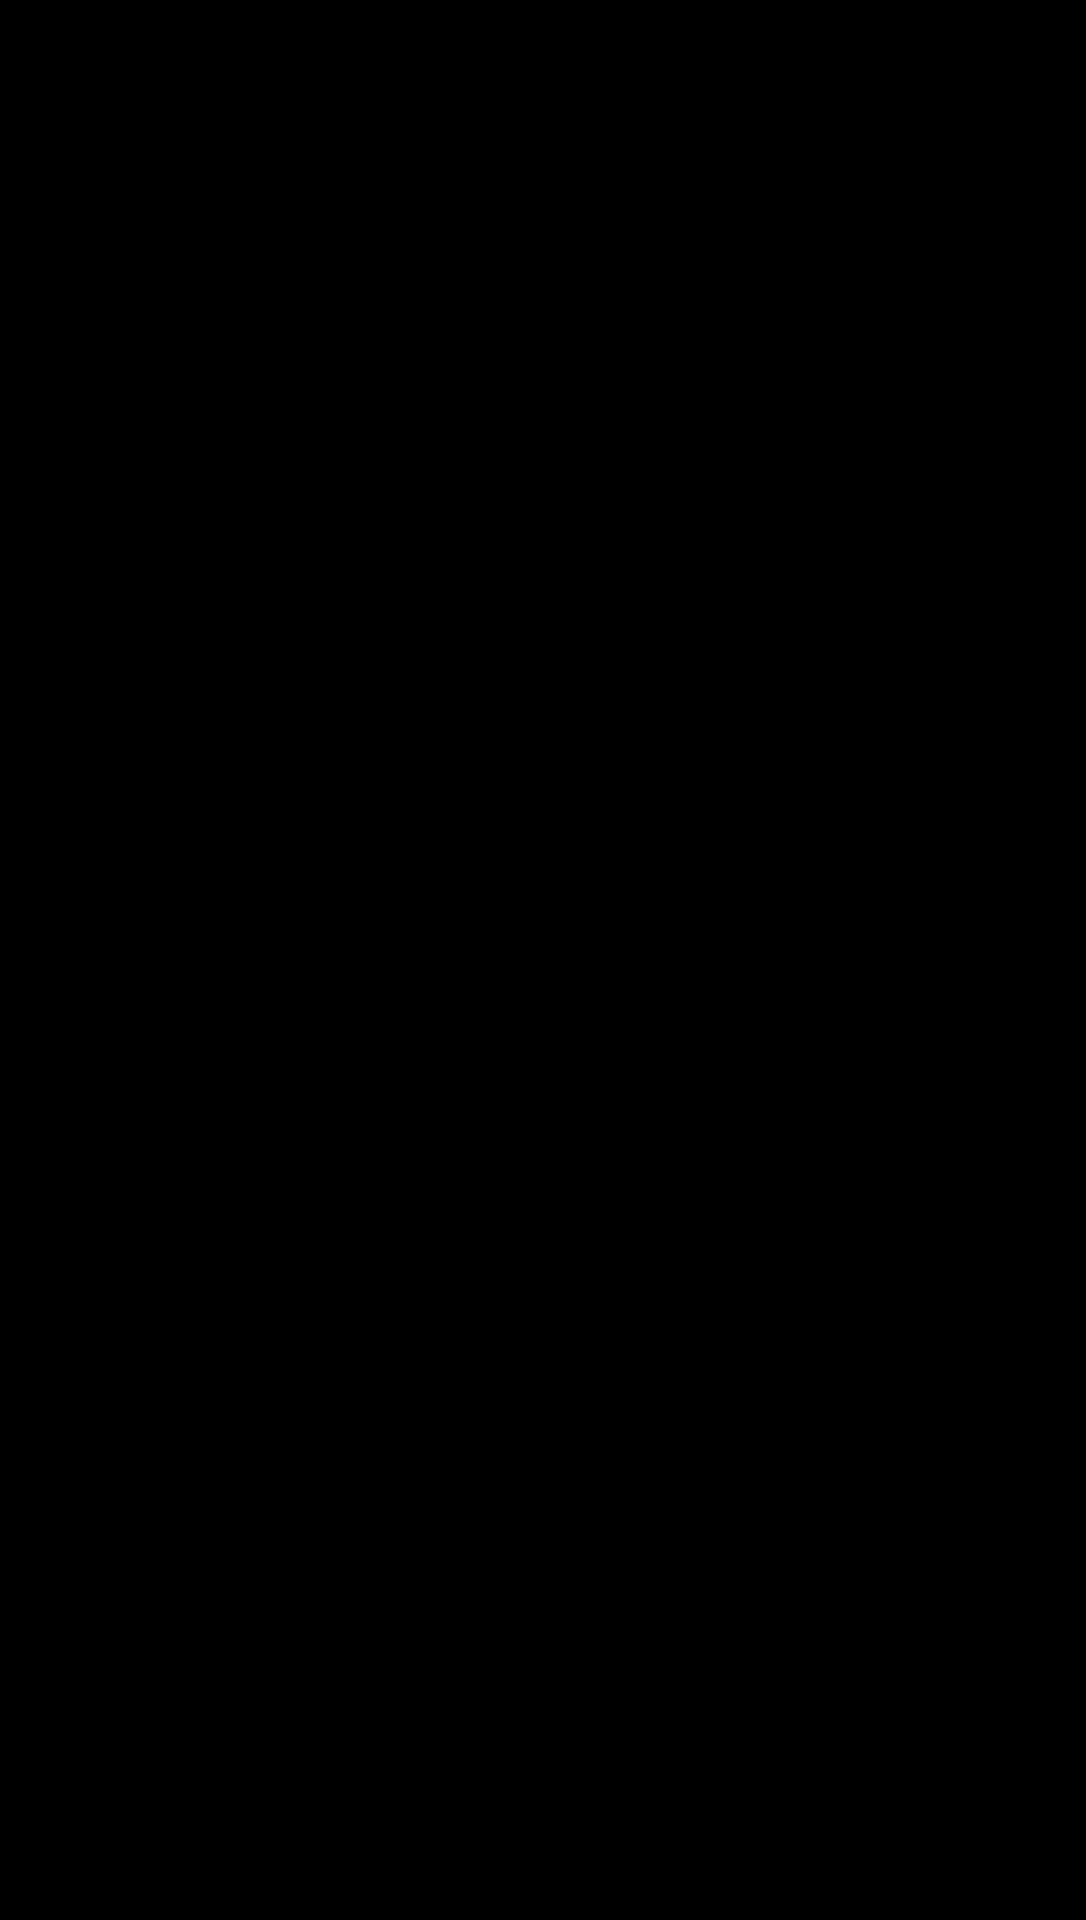 imag4932